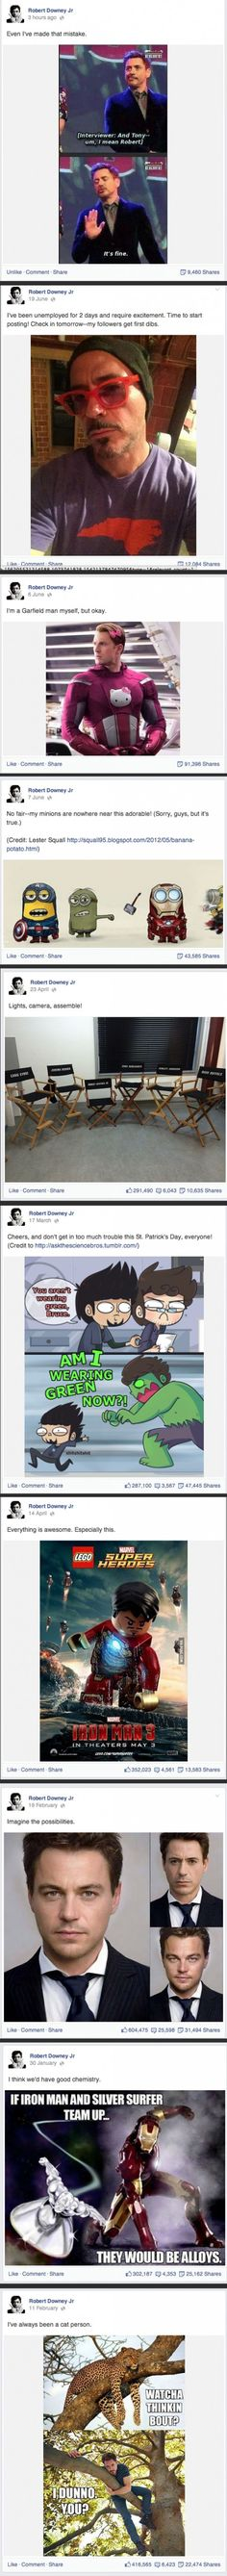 Let's Follow Robert Downey Jr's Facebook Page. #RobertDowneyJr